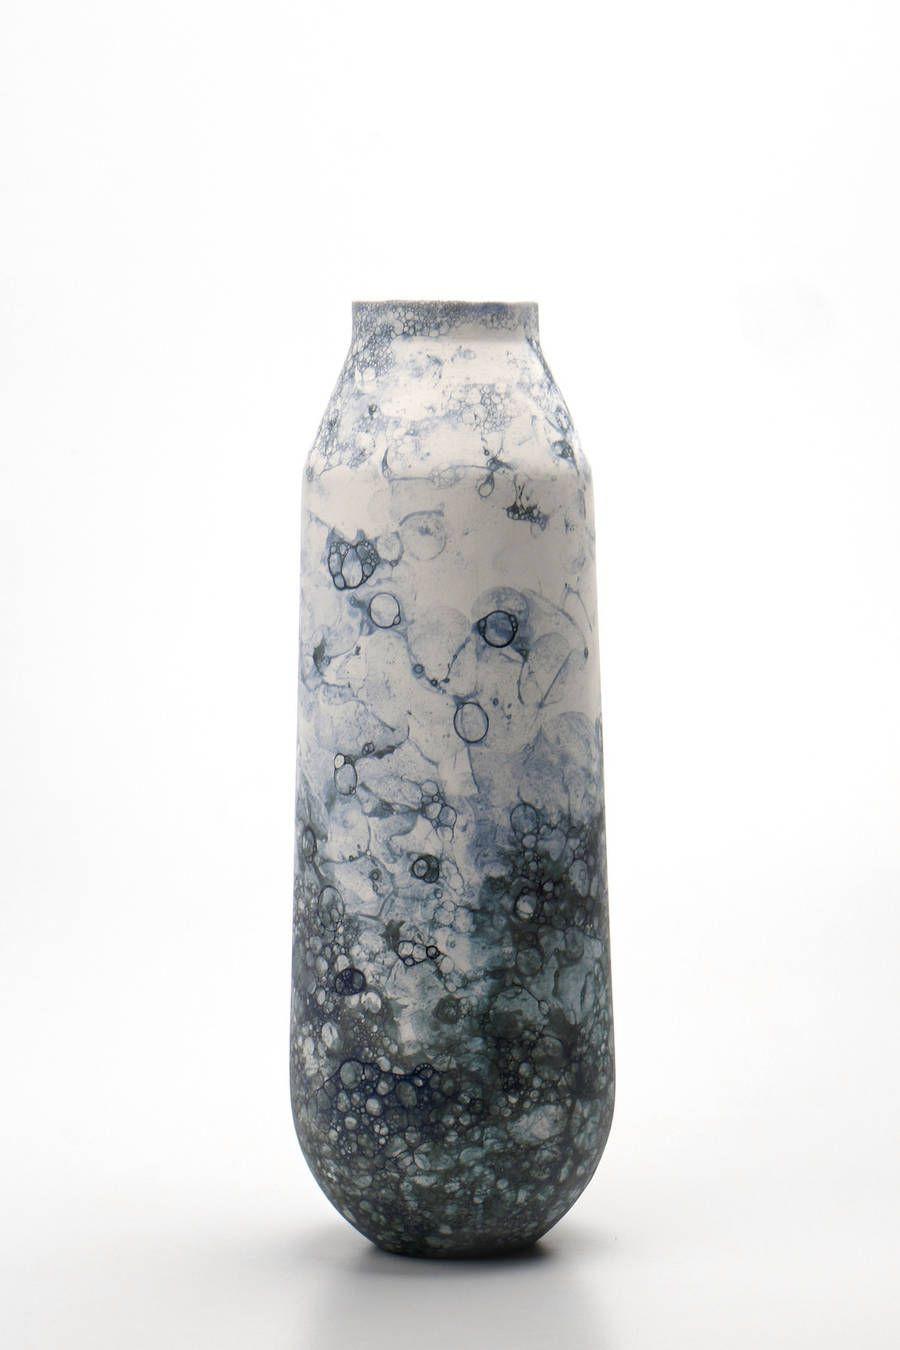 18 attractive Clay Vase Designs 2021 free download clay vase designs of bubblegraphy vases pottery pottery ideas and ceramic art in bubblegraphy vases